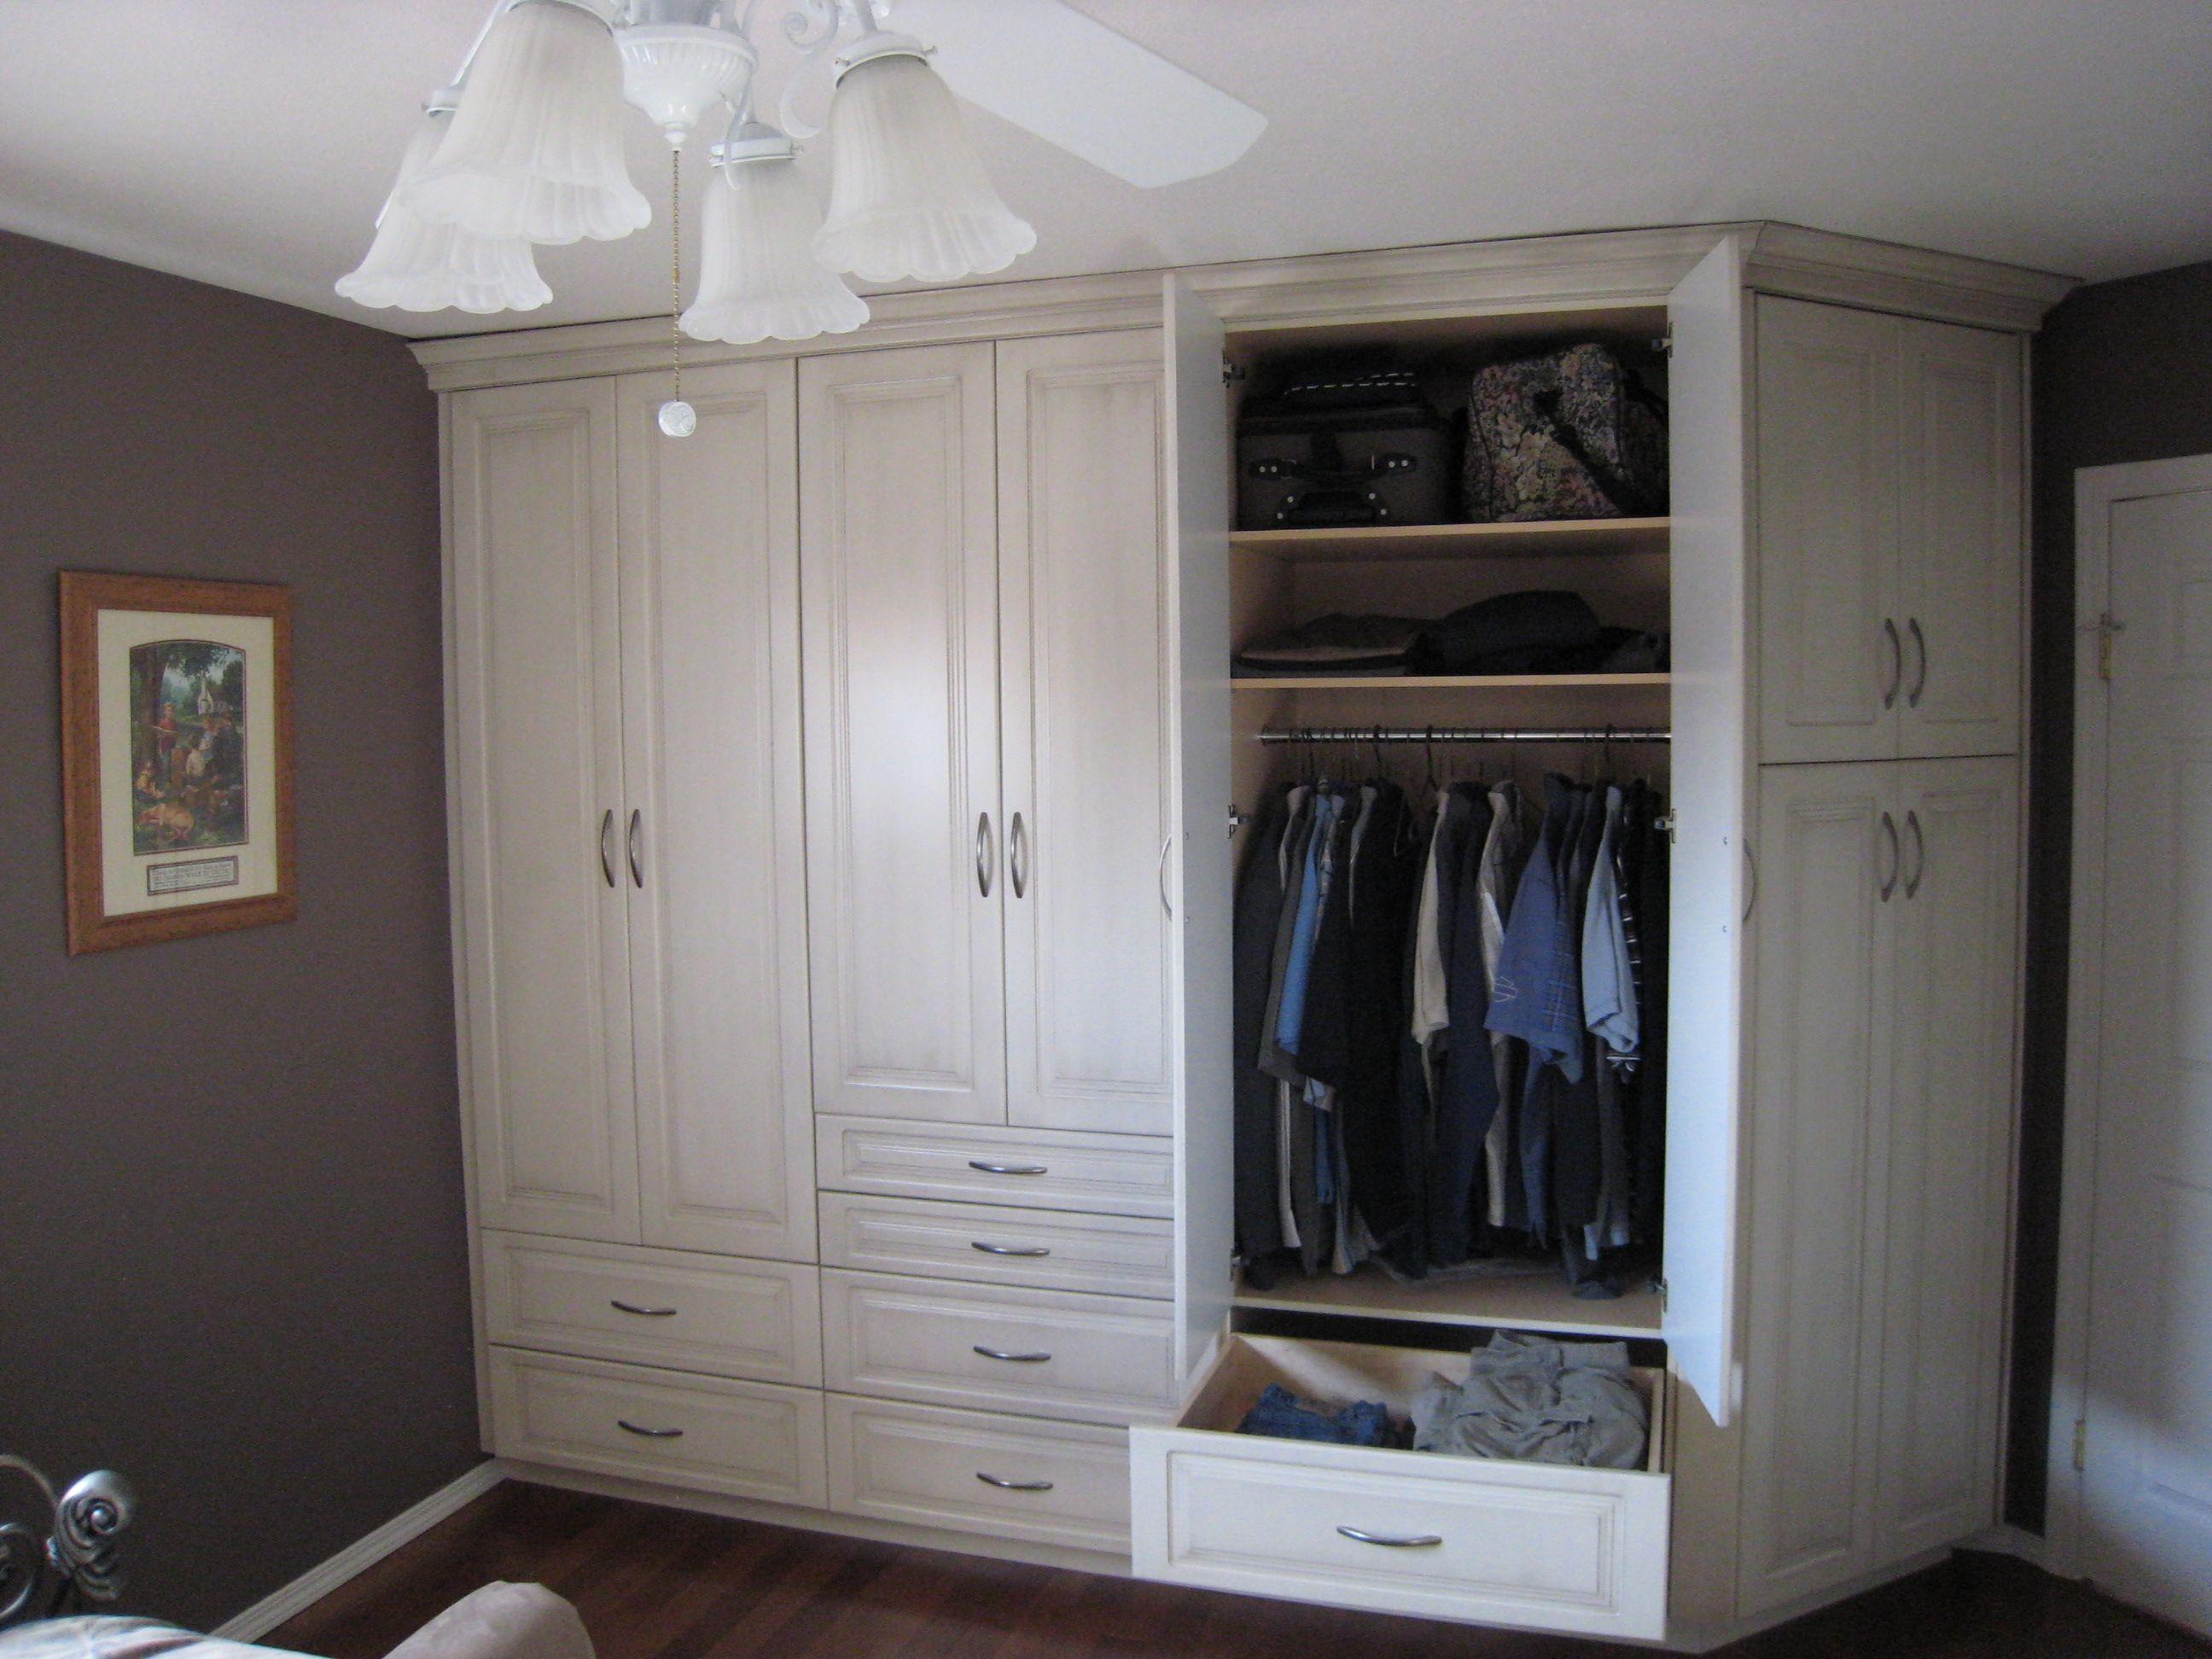 jpg idea a to build closet for how bedroom entrancing small bedrooms k walk ideas built inspiring in